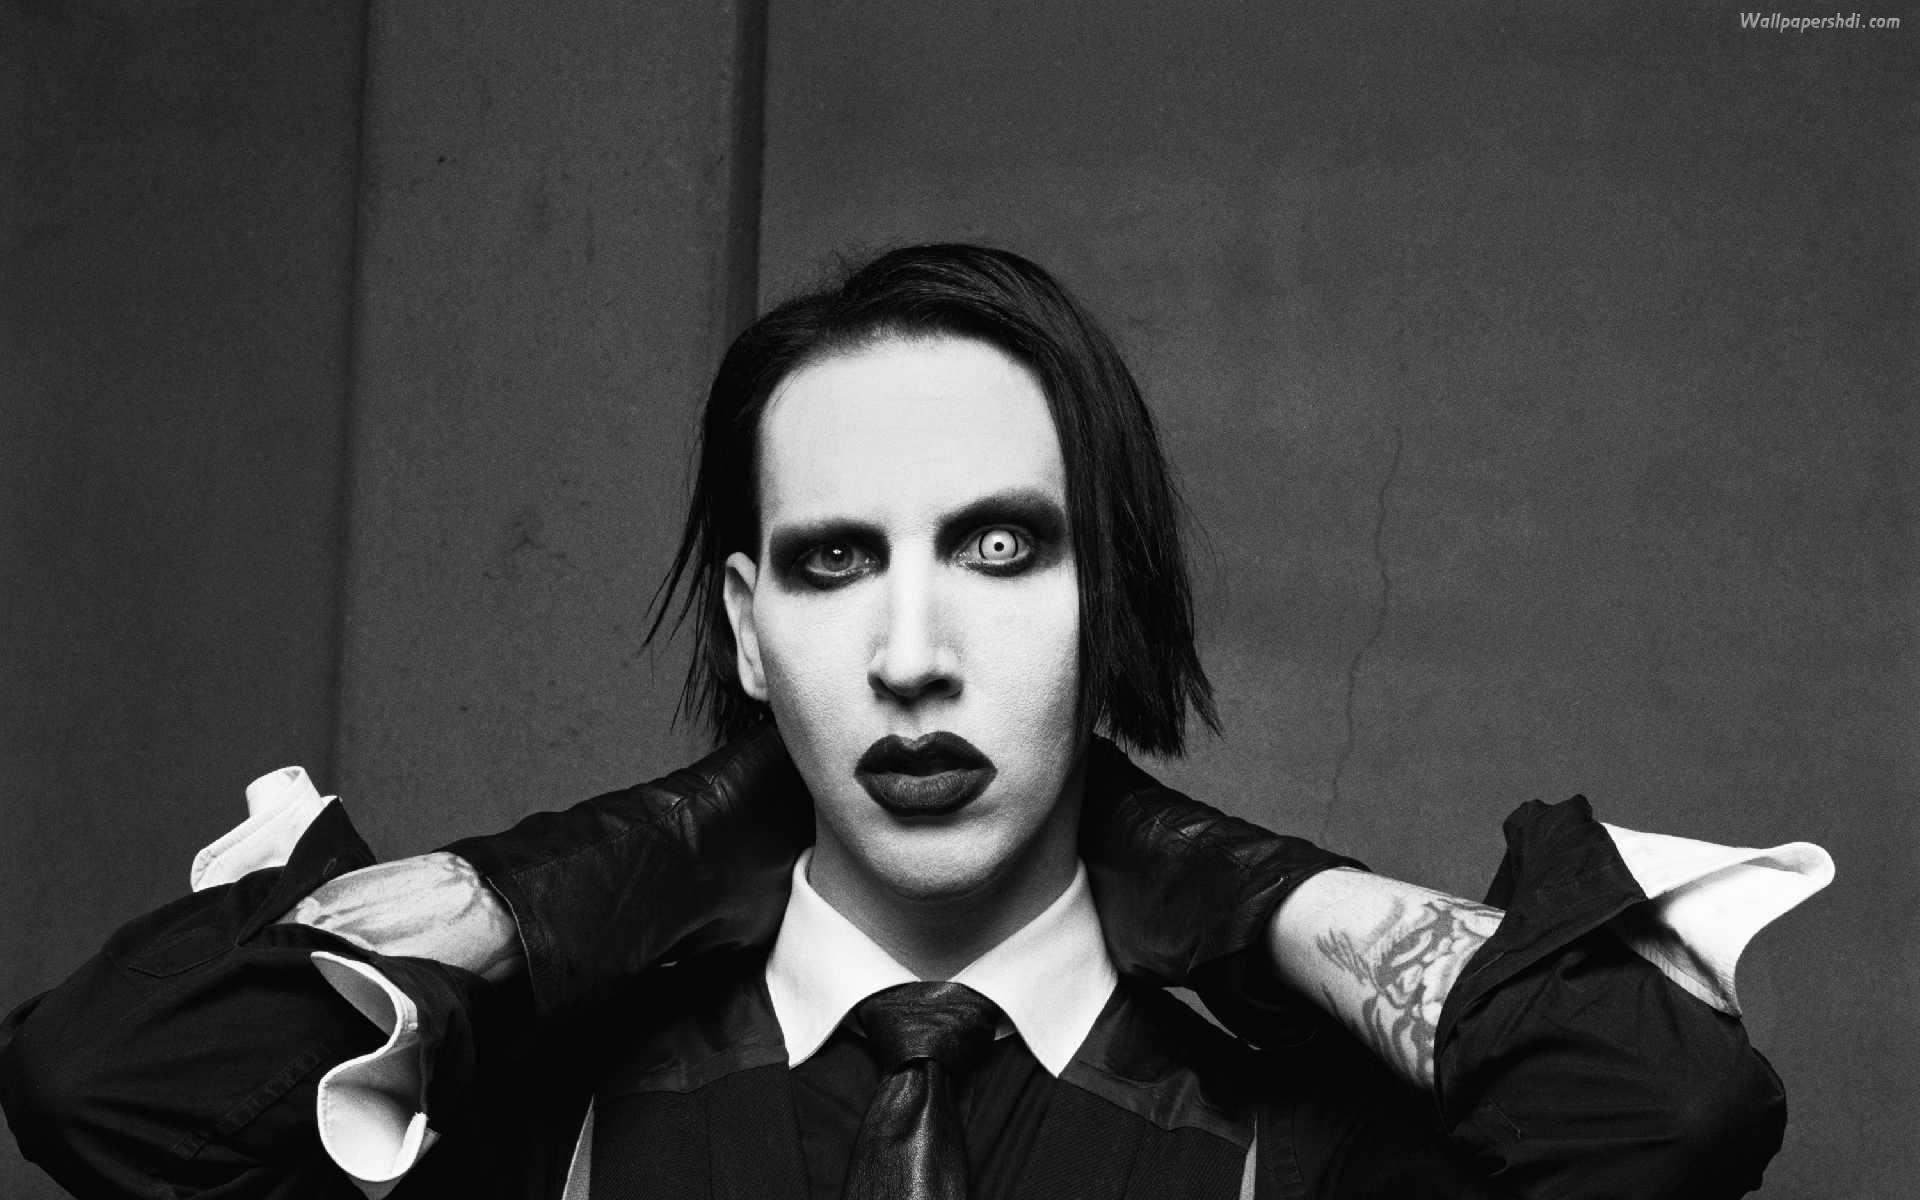 Marilyn Manson Wallpapers HD